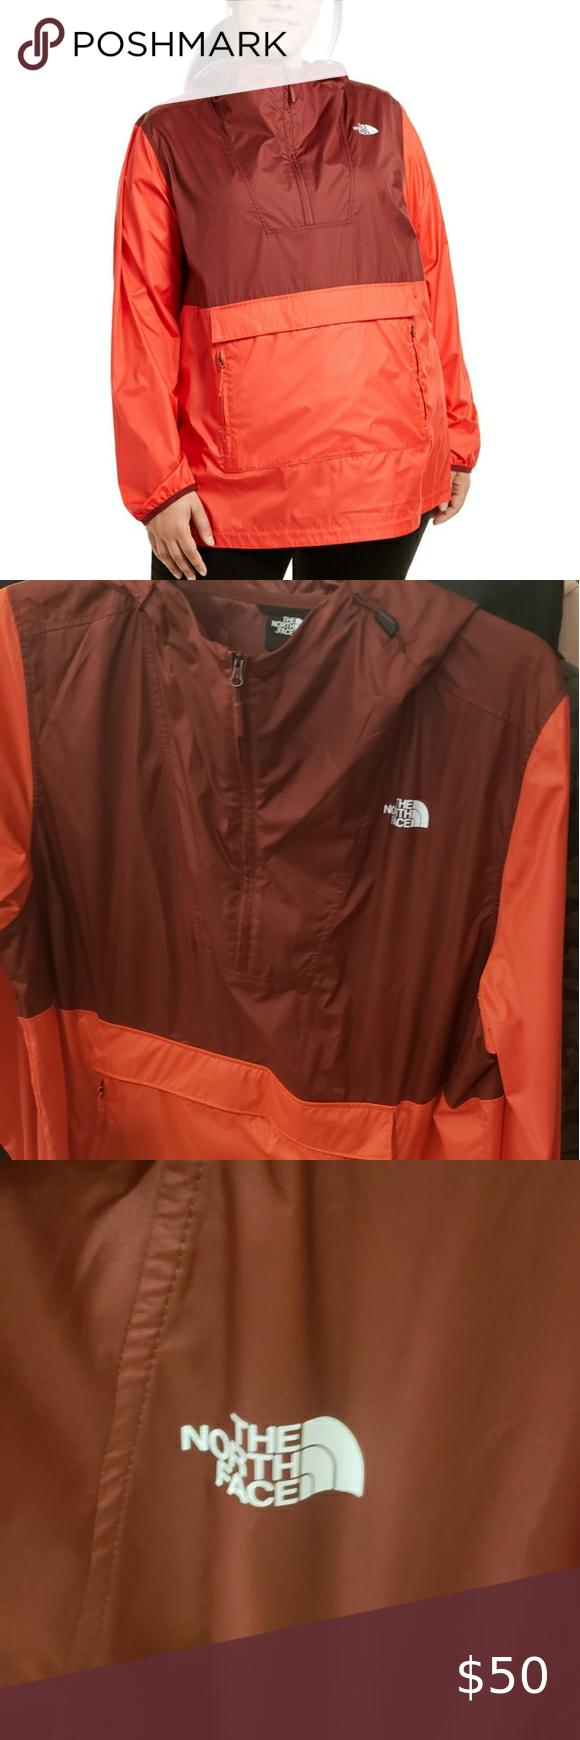 The Northface Jacket Plus Size North Face Jacket Jackets Clothes Design [ 1740 x 580 Pixel ]